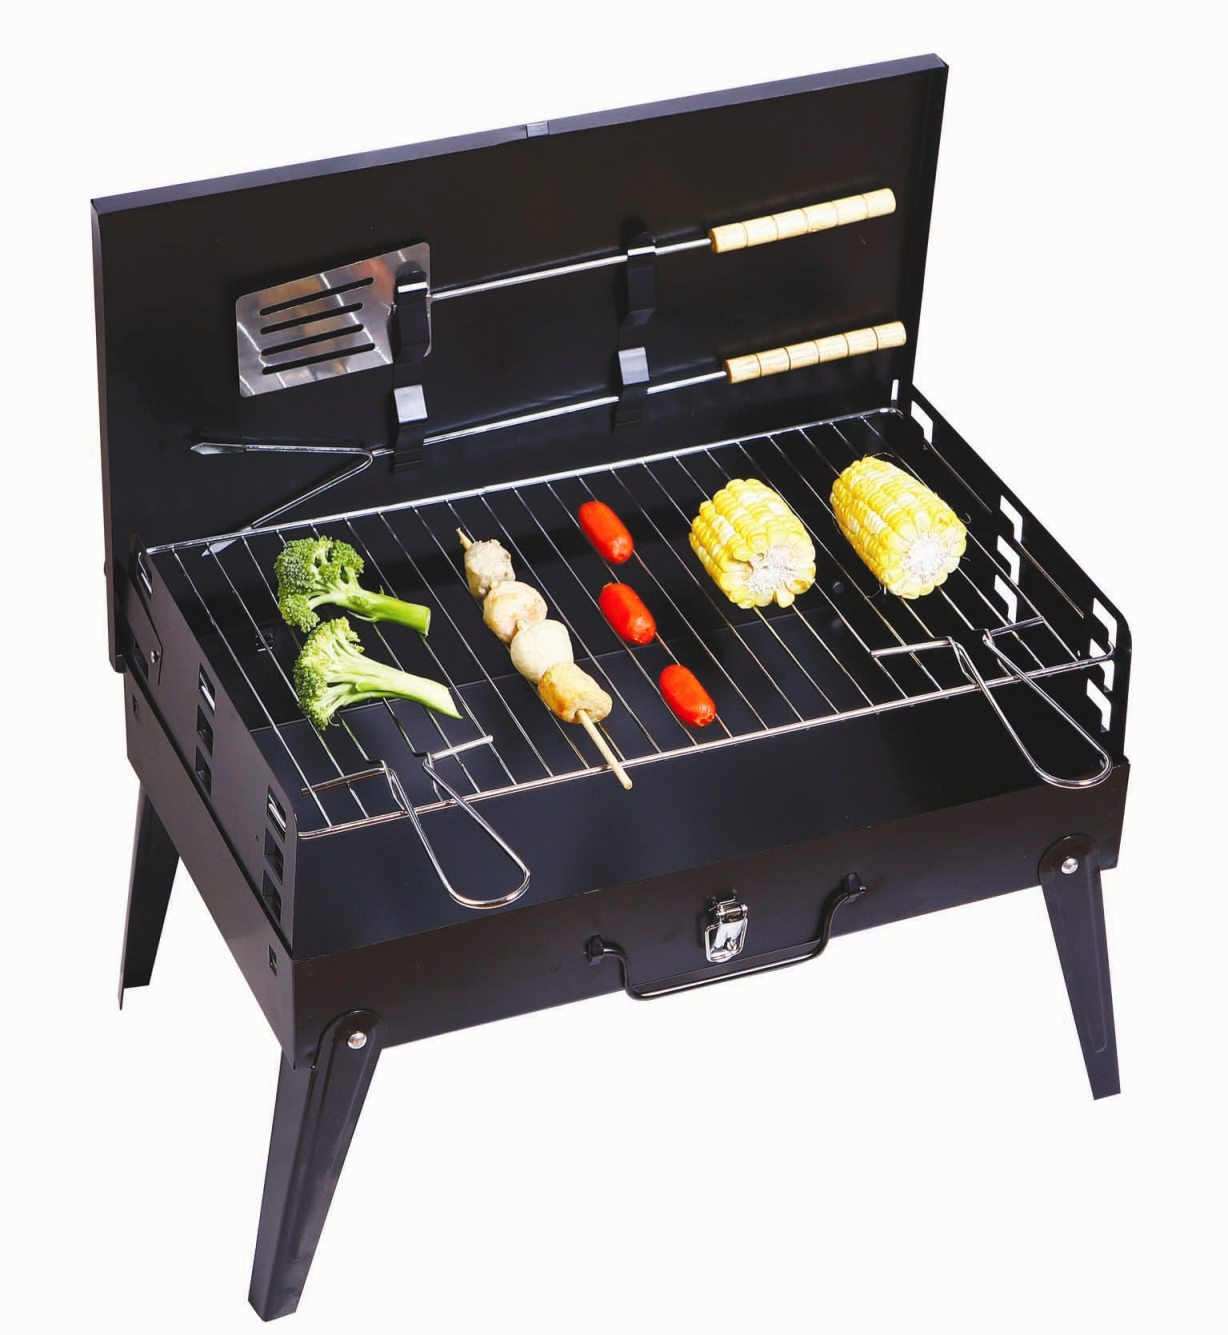 d203caa3001933d9759c_9d5627081c5afbf76ba2f80cfc5a79b0barbecue-oven.jpg